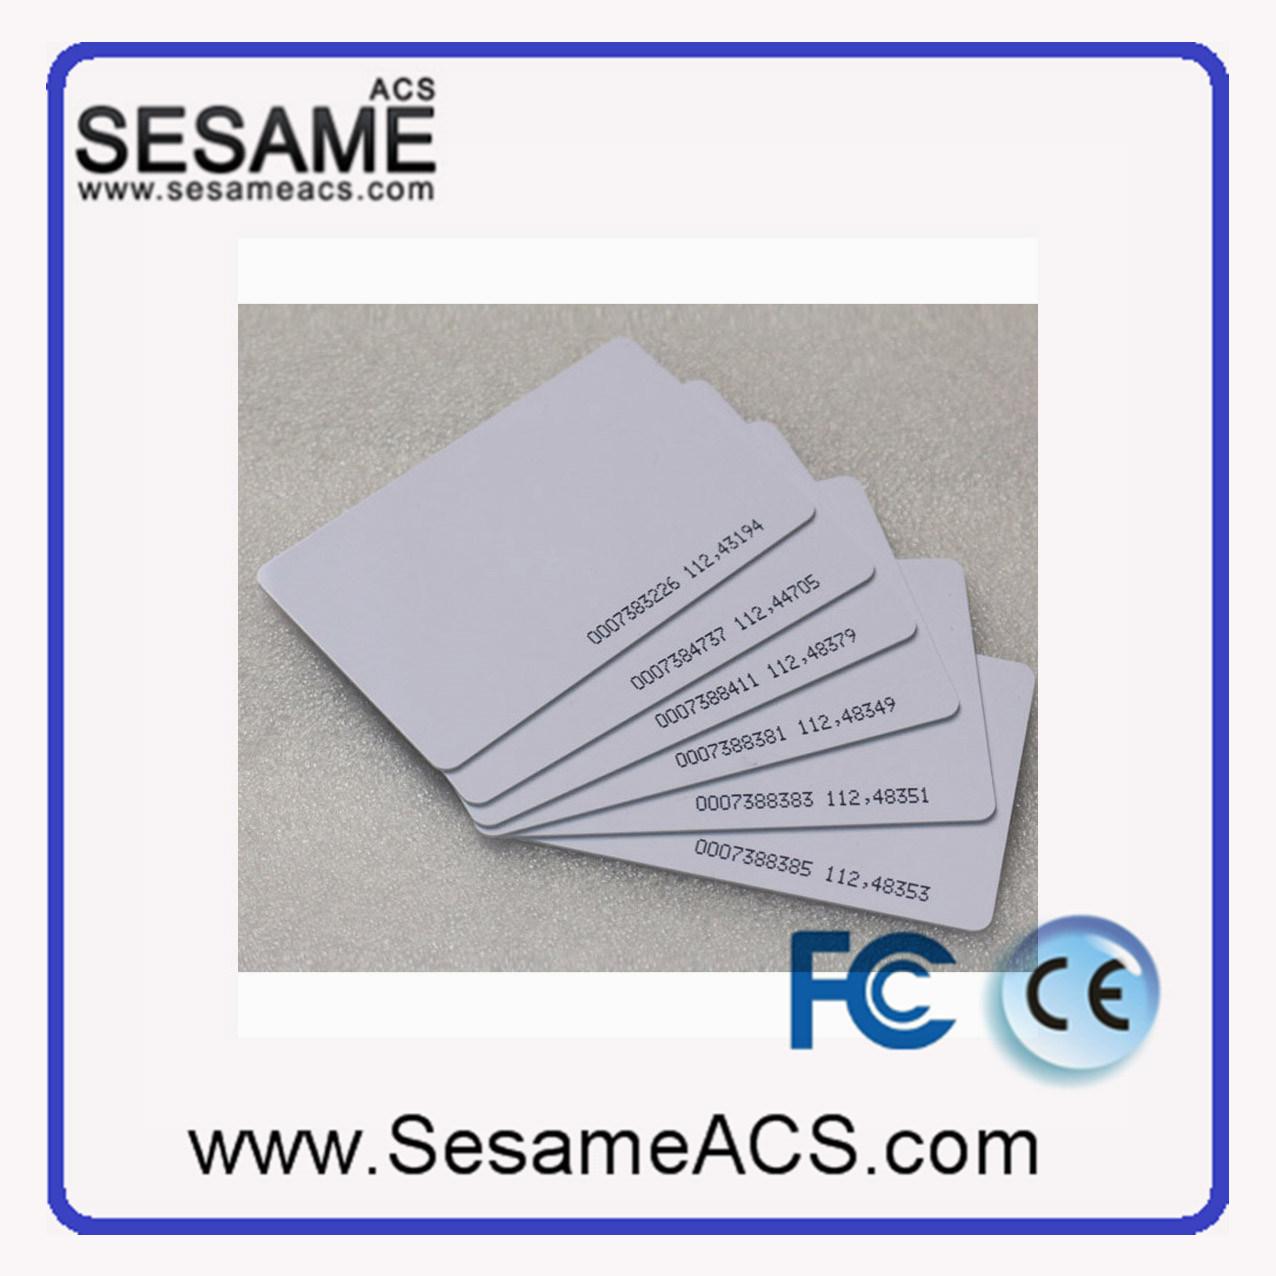 125kHz Em Card/Smart Card (SD5)